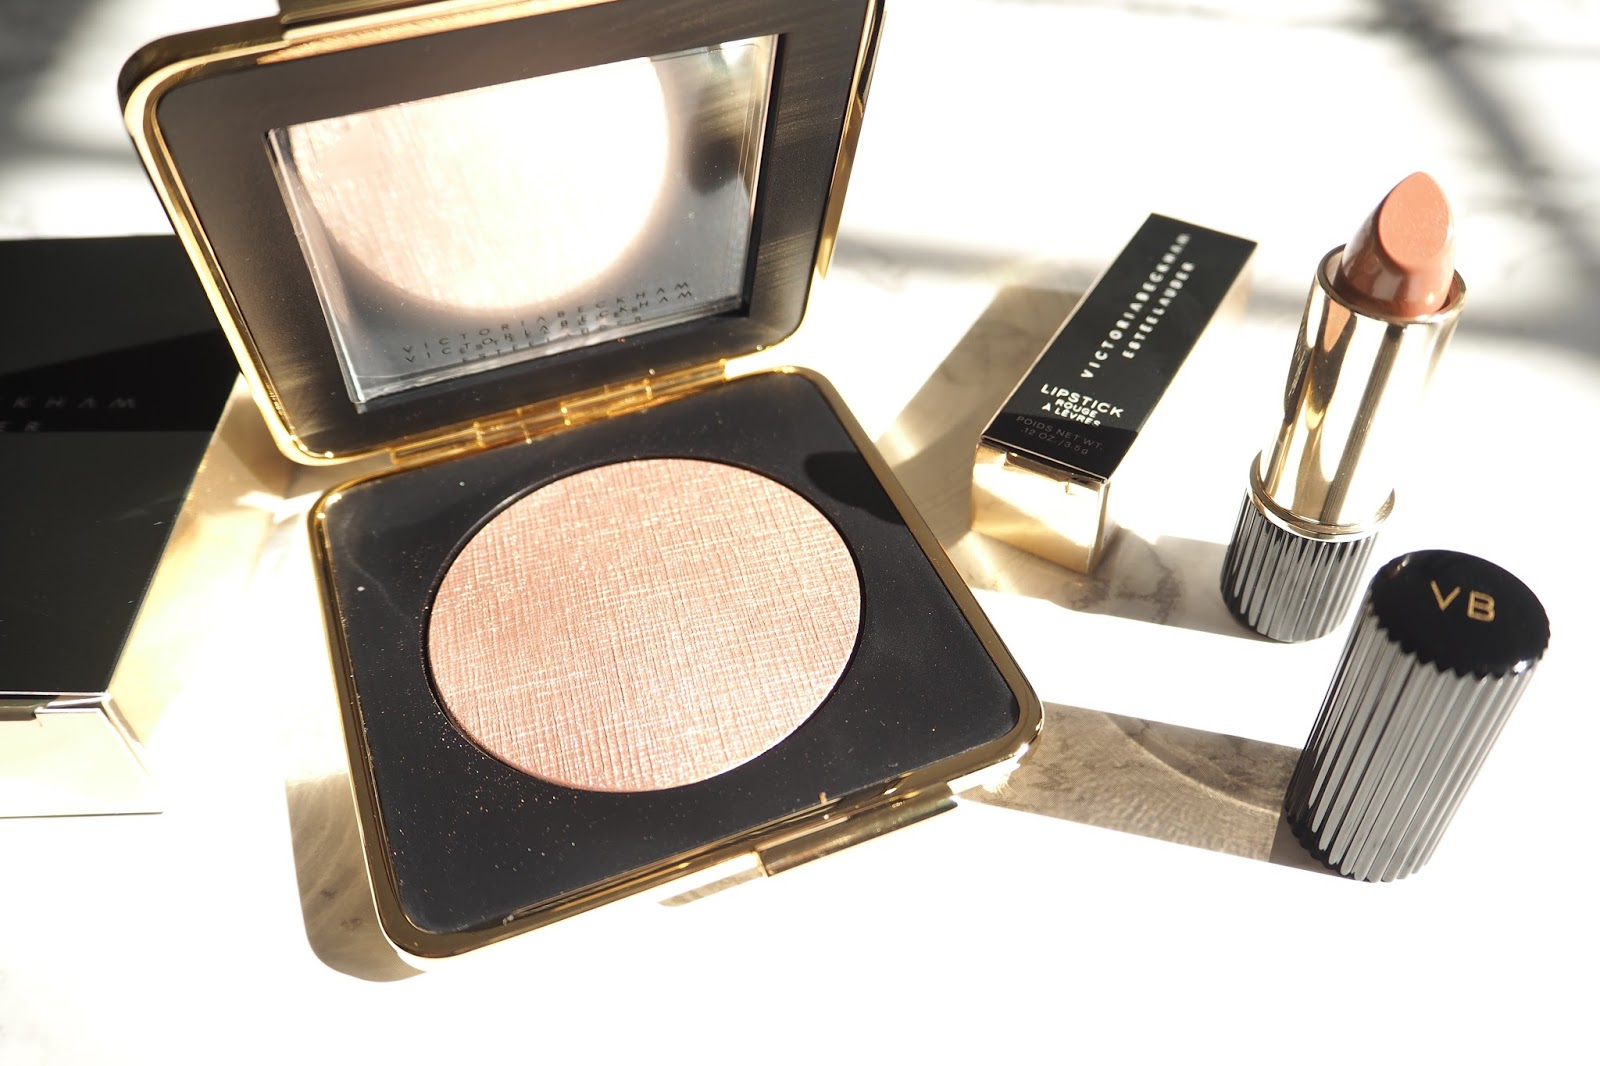 Victoria Beckham X Estee Lauder Makeup